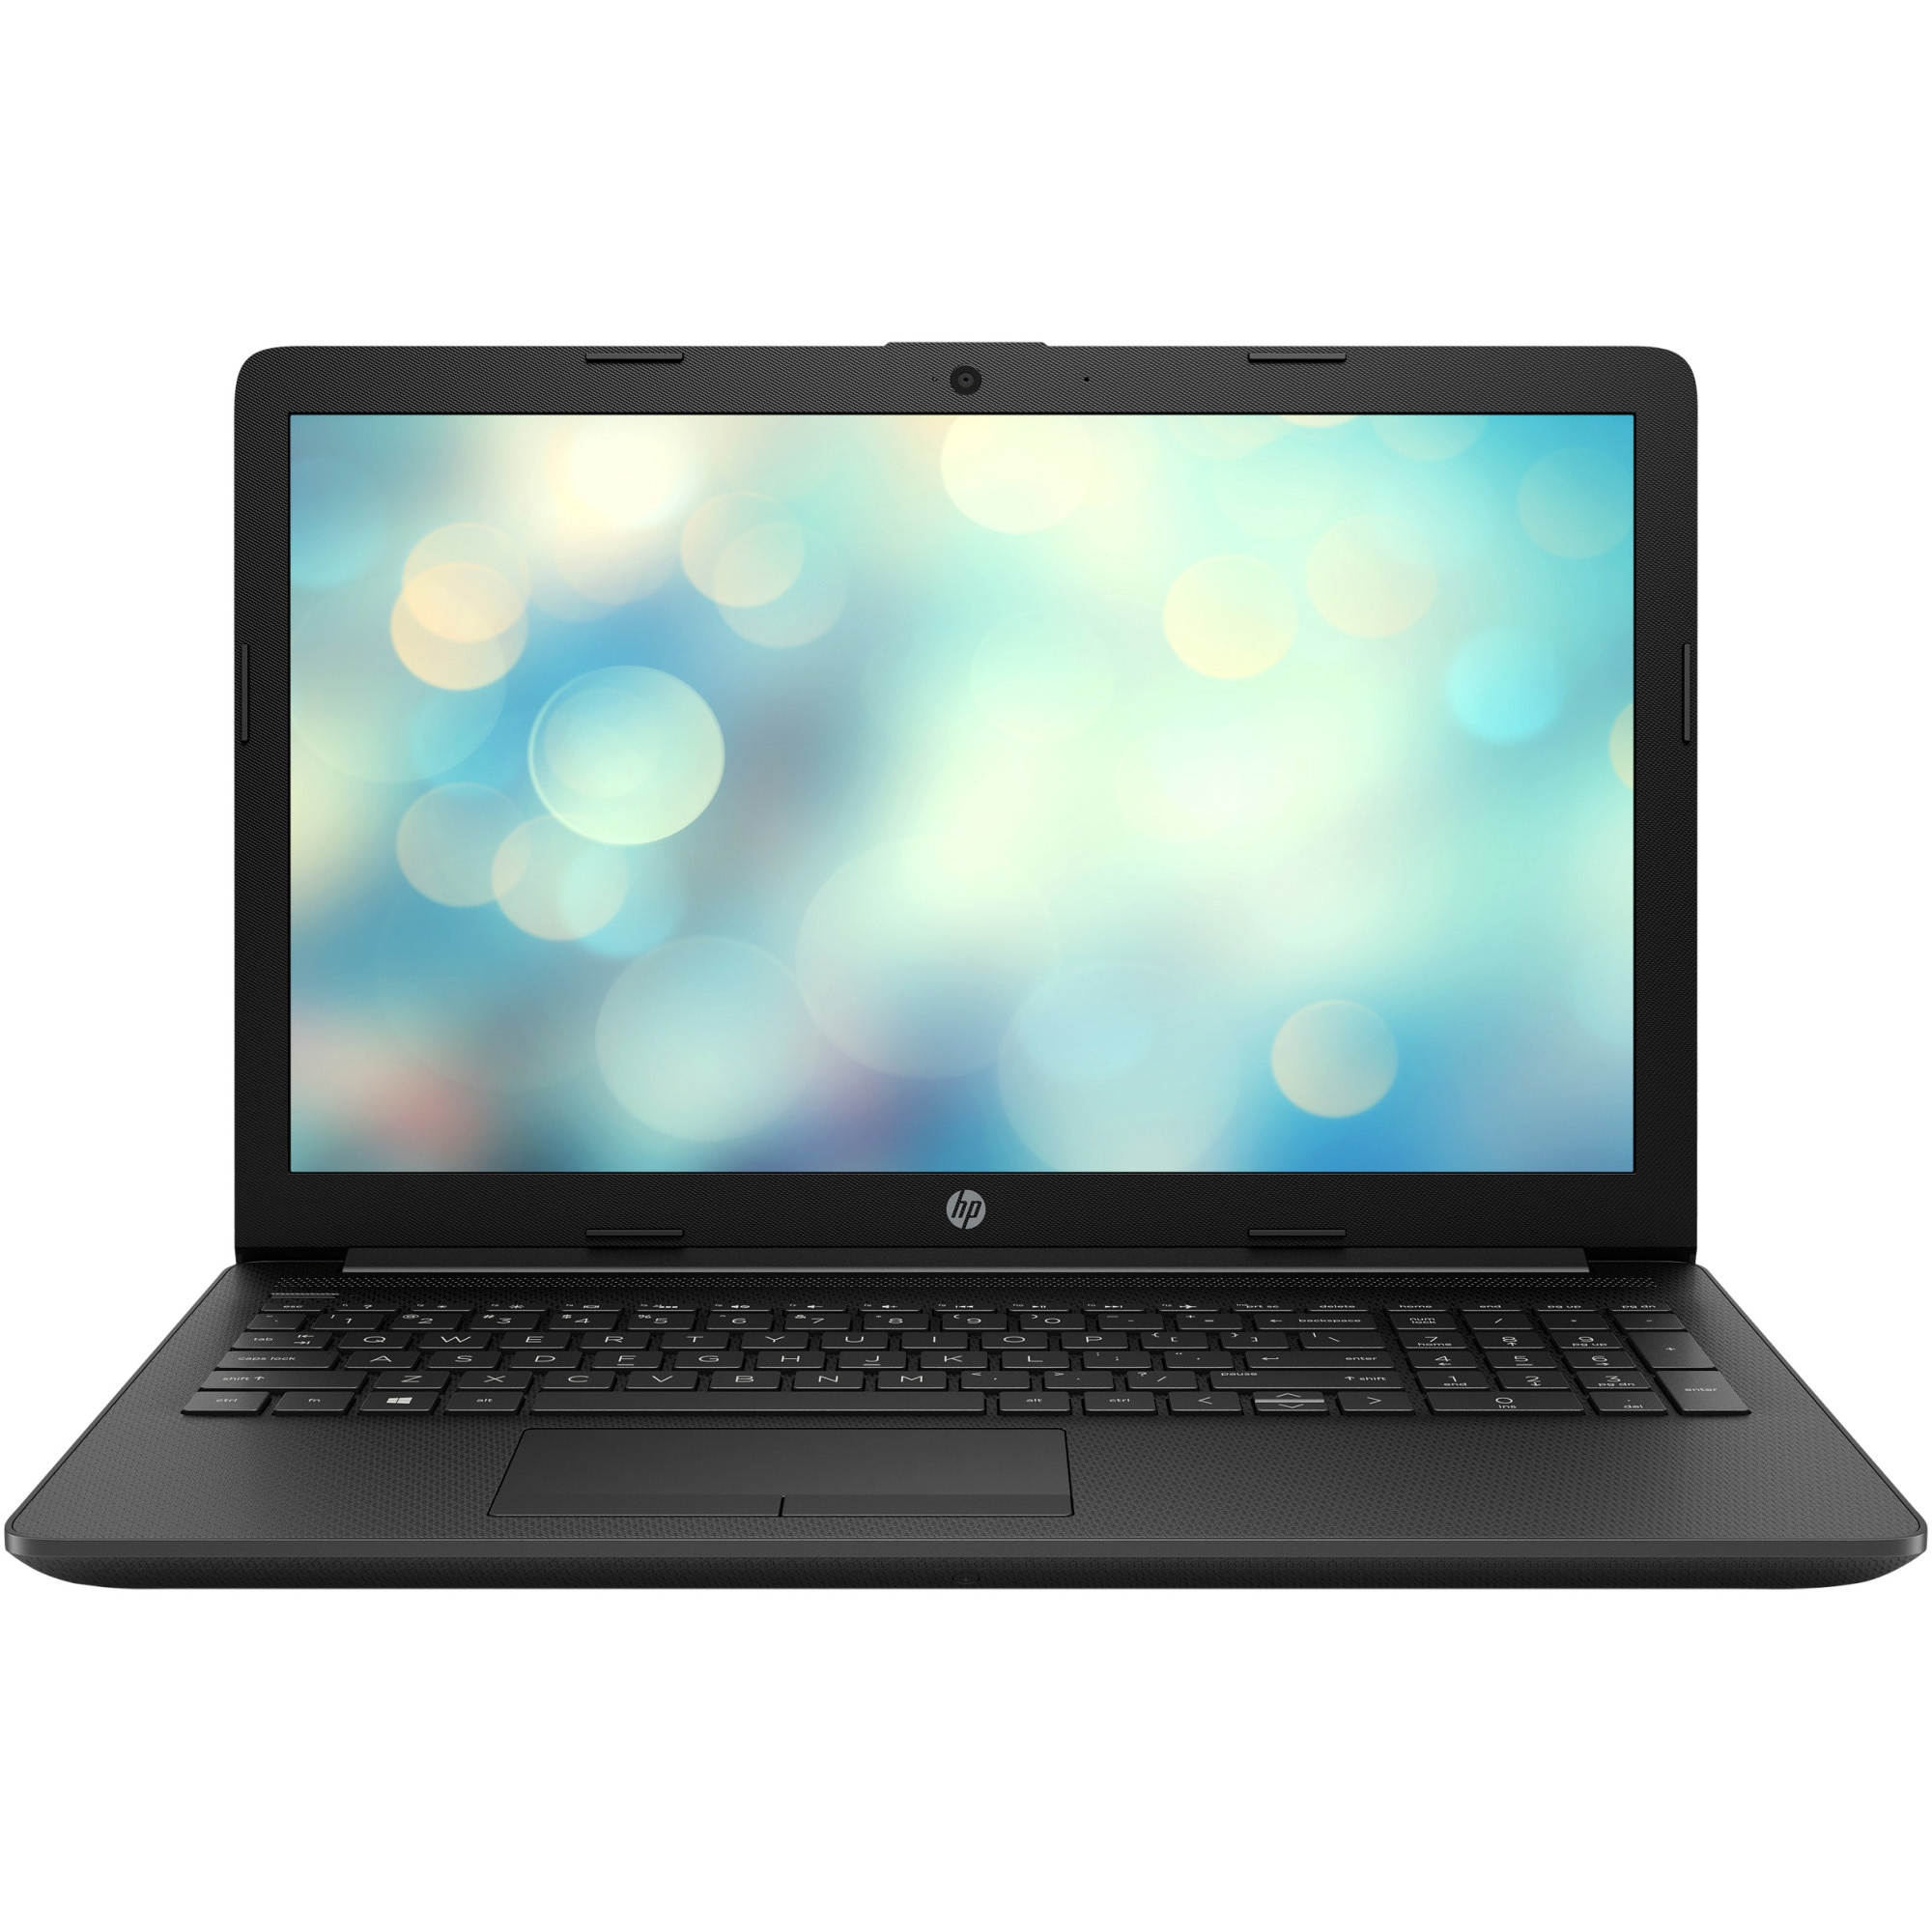 "Fotografie Laptop HP 15-db1033nq cu procesor AMD Ryzen™ 3 3200U pana la 3.50 GHz, 15.6"", Full HD, 8GB, 512GB SSD, AMD Radeon™ Vega 3, Free DOS, Black"